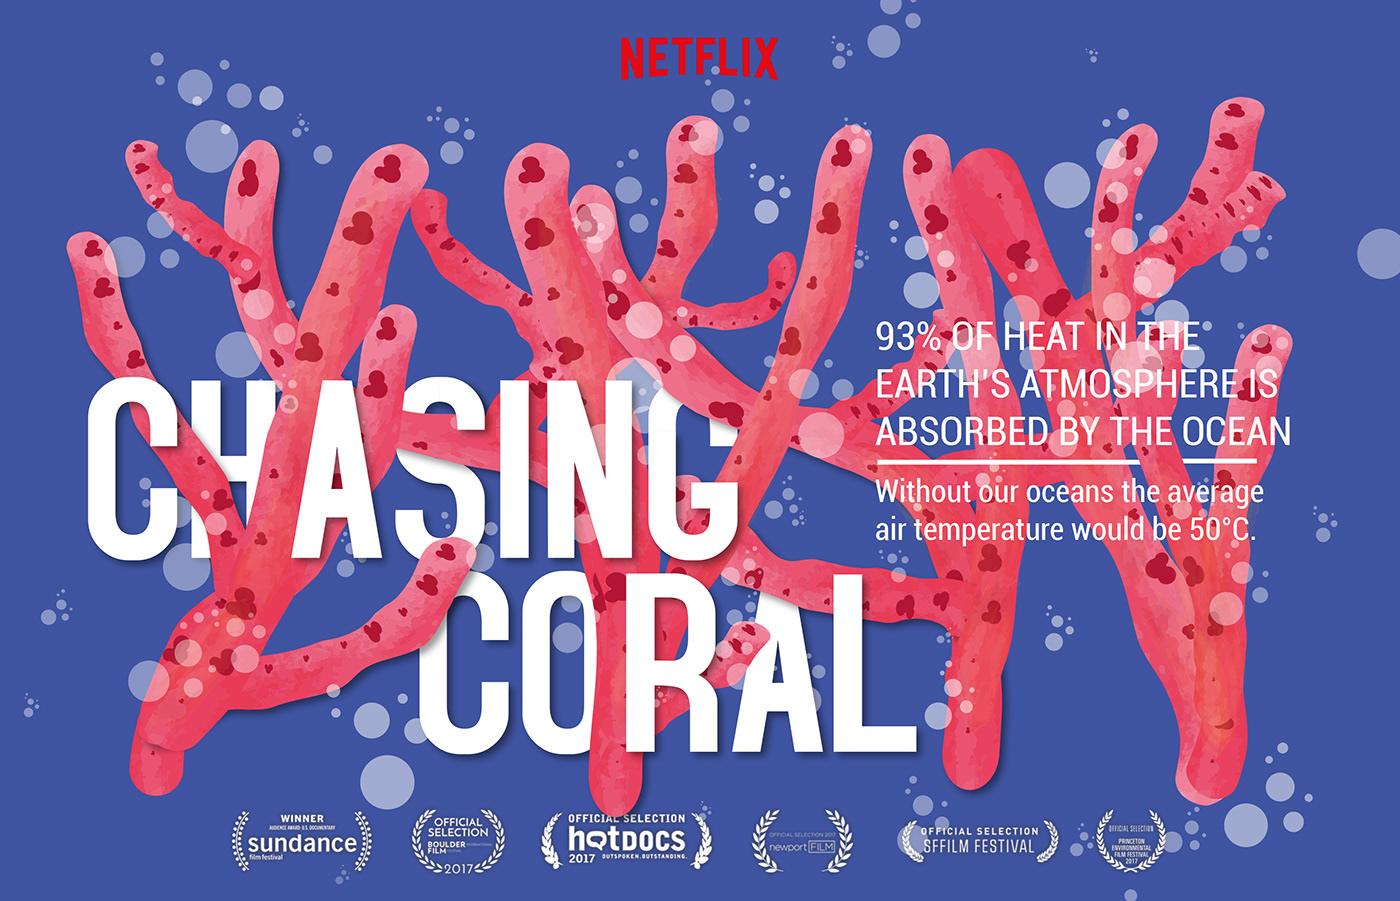 chasing coral coral ILLUSTRATION  Ocean sundance hotdocs poster illustration Netflix